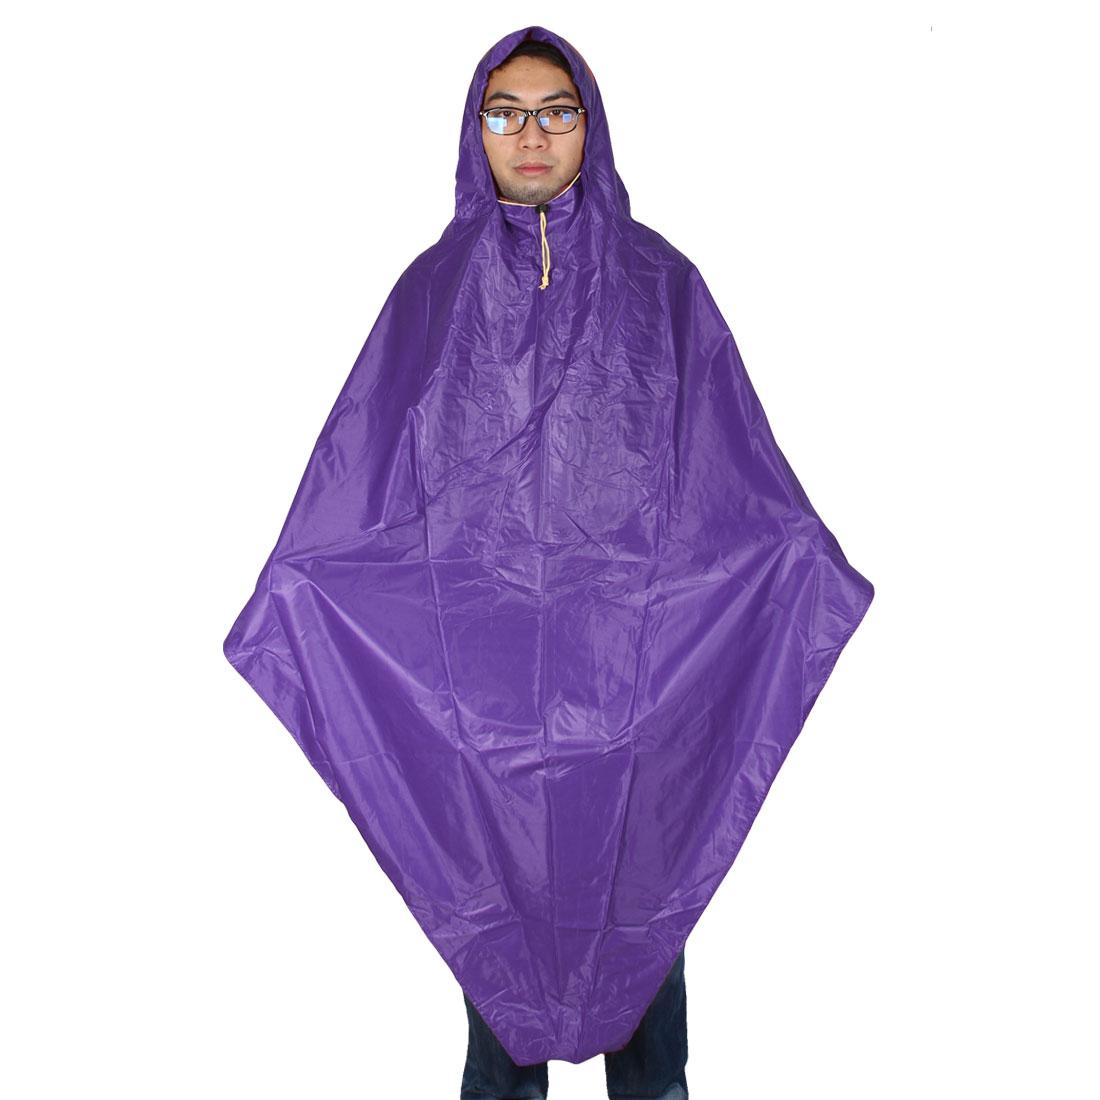 Lady Man Purple Cycling Bike Bicycle Plastic Hooded Raincoat Poncho